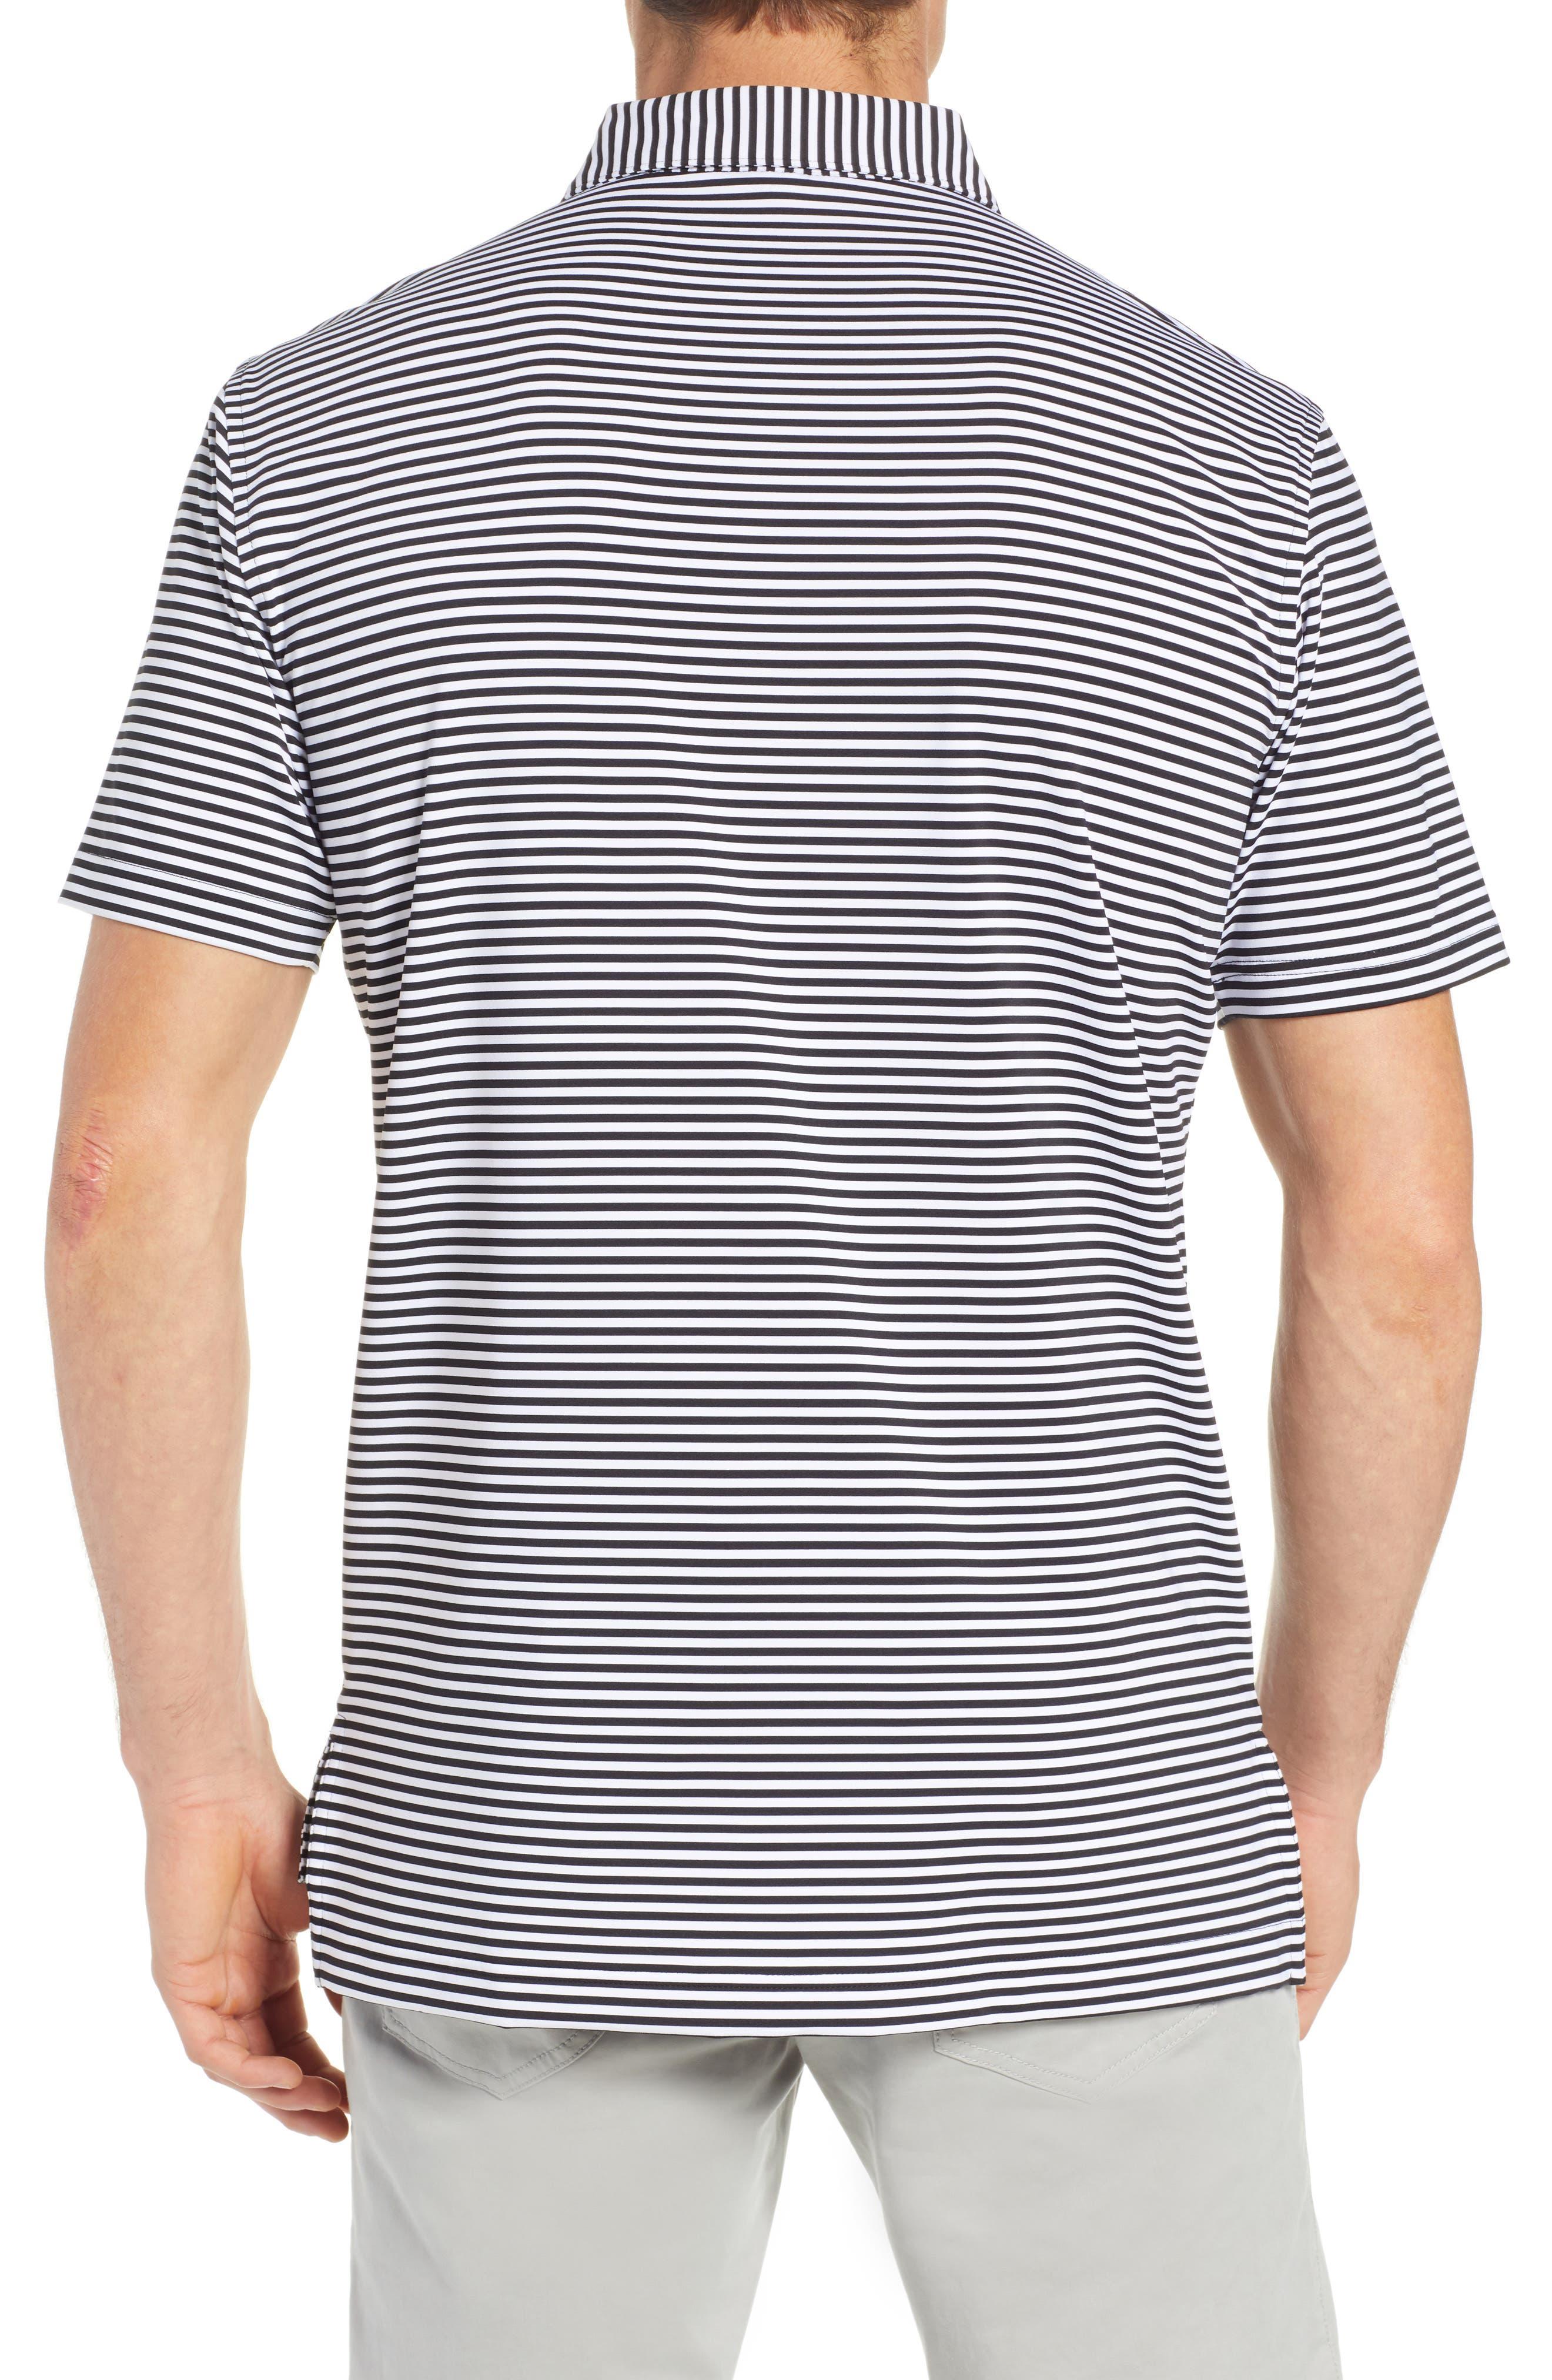 PETER MILLAR, Stripe Stretch Jersey Performance Polo, Alternate thumbnail 2, color, BLACK/WHITE